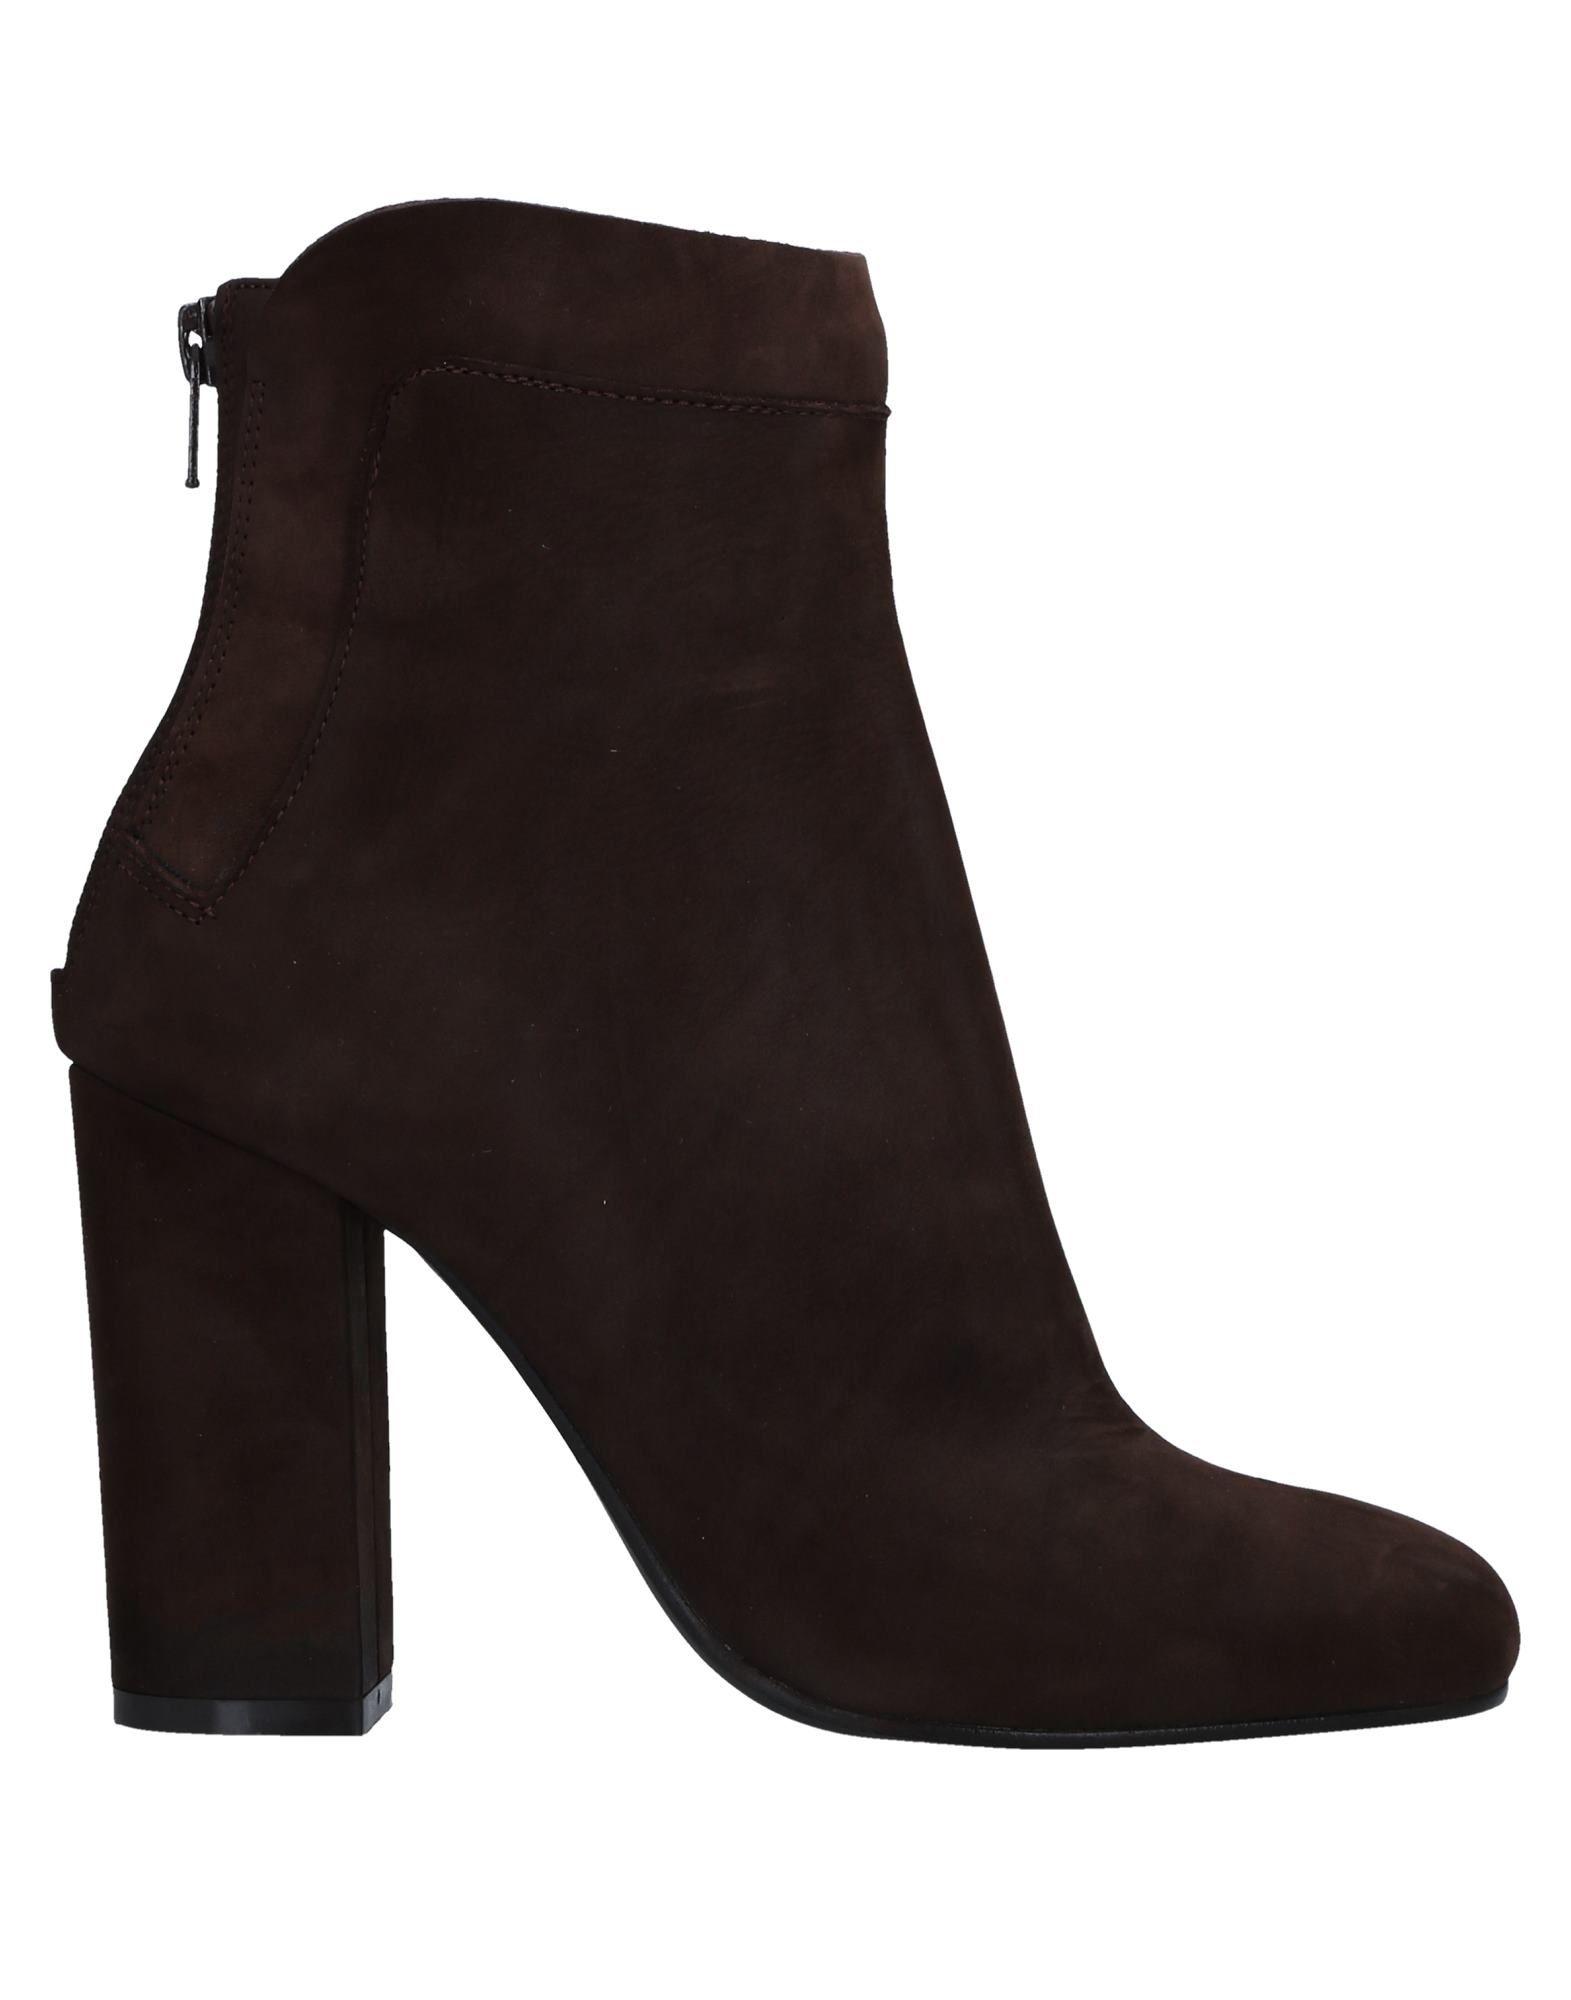 FIORIFRANCESI Ankle Boot in Dark Brown